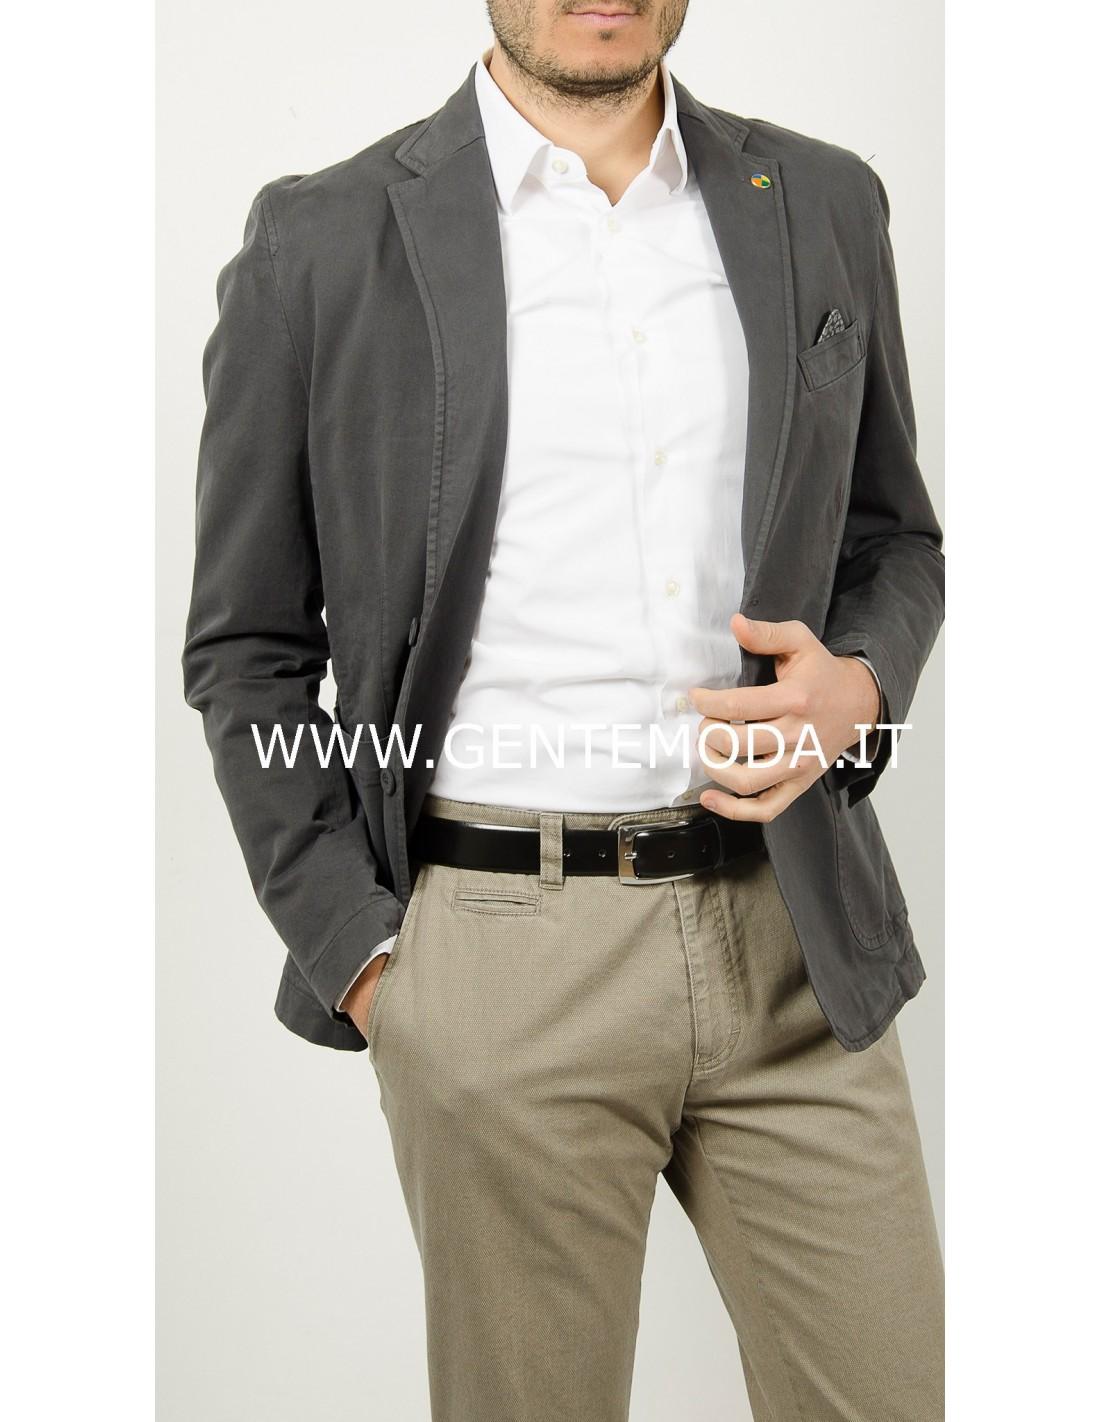 uomo pantalone grigio giacca beige